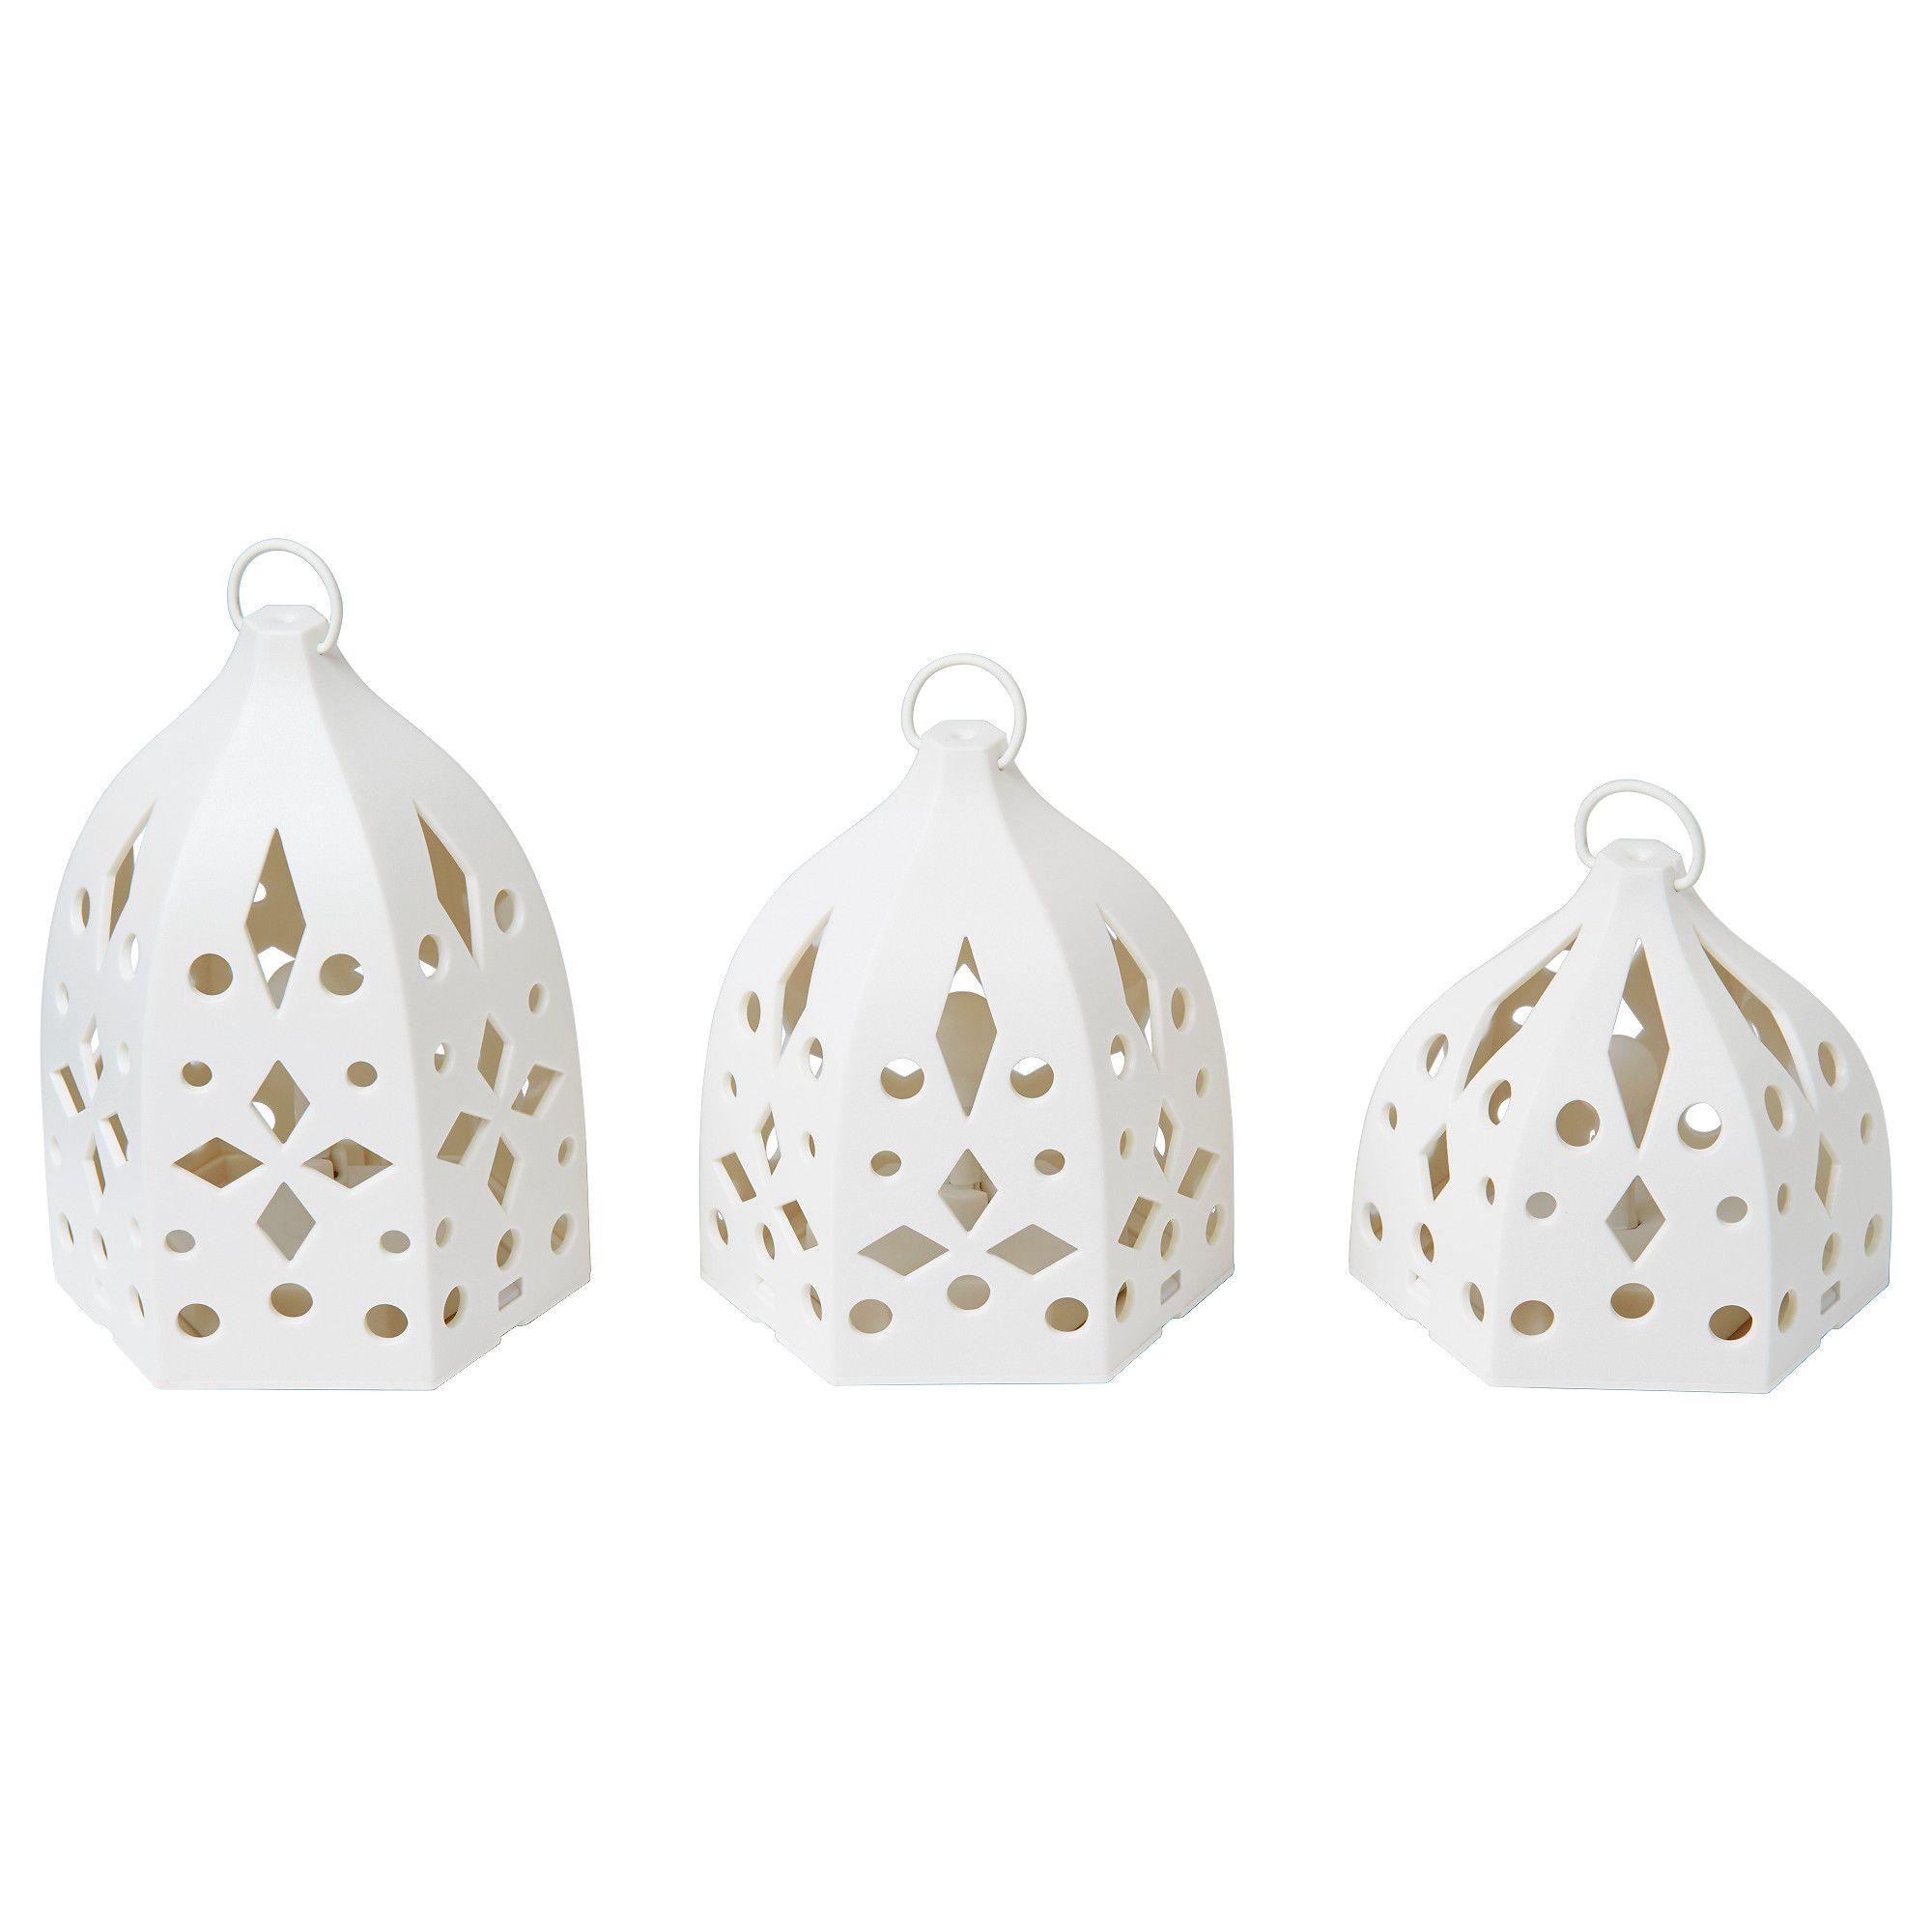 Us Furniture And Home Furnishings Led Lantern Ikea Lanterns